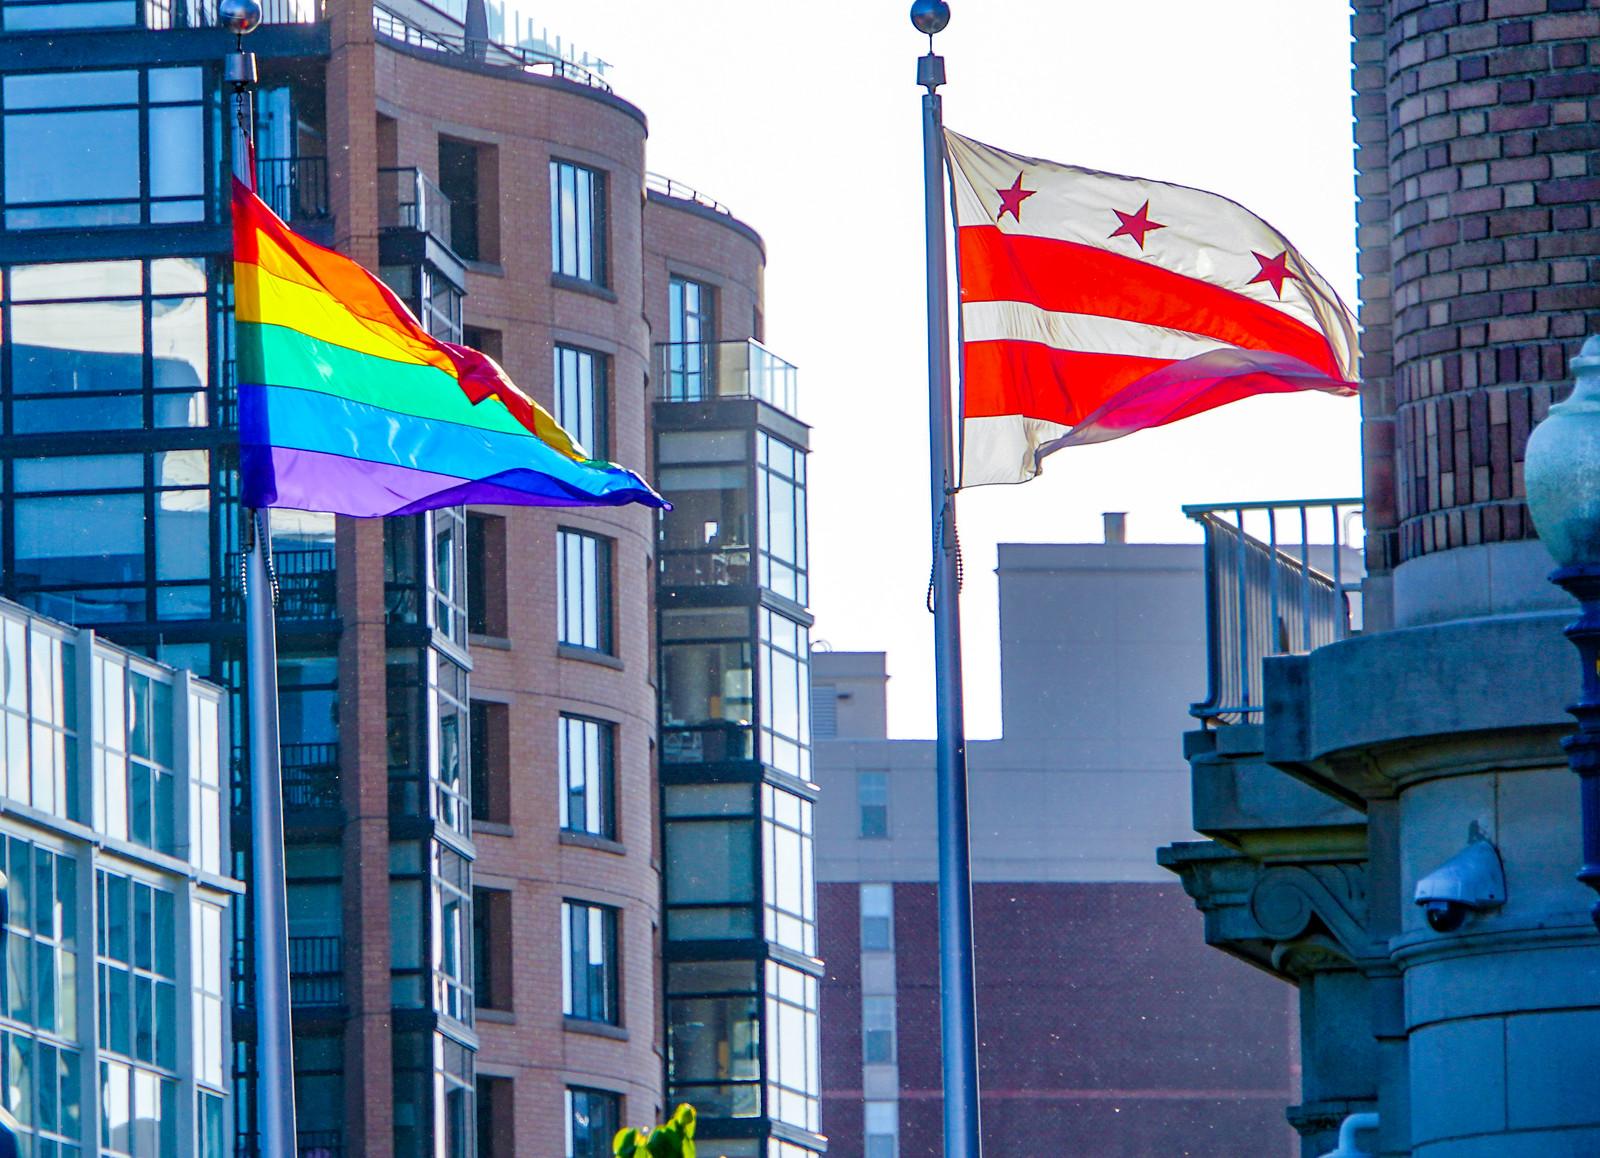 2018.06.04 Capital Pride People and Places, Washington, DC USA 02760